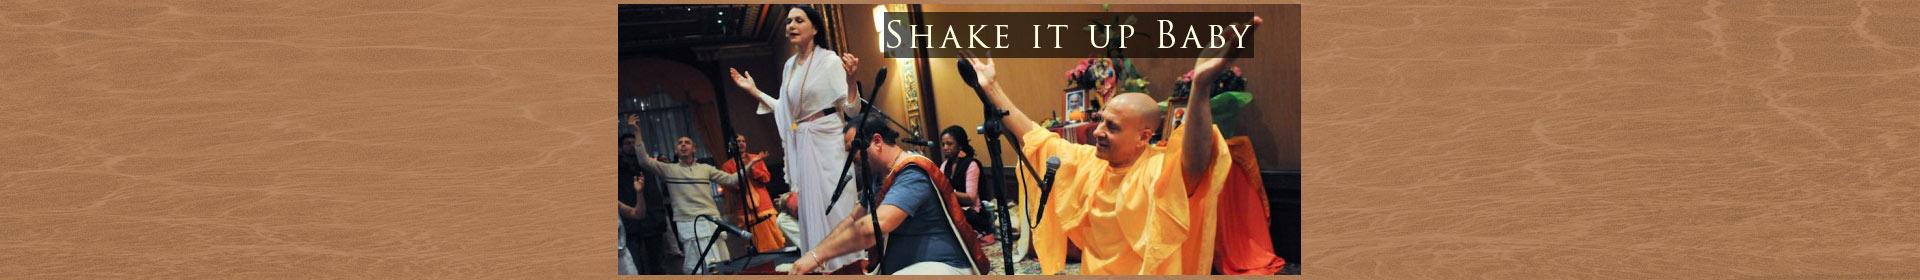 Shake it up Baby